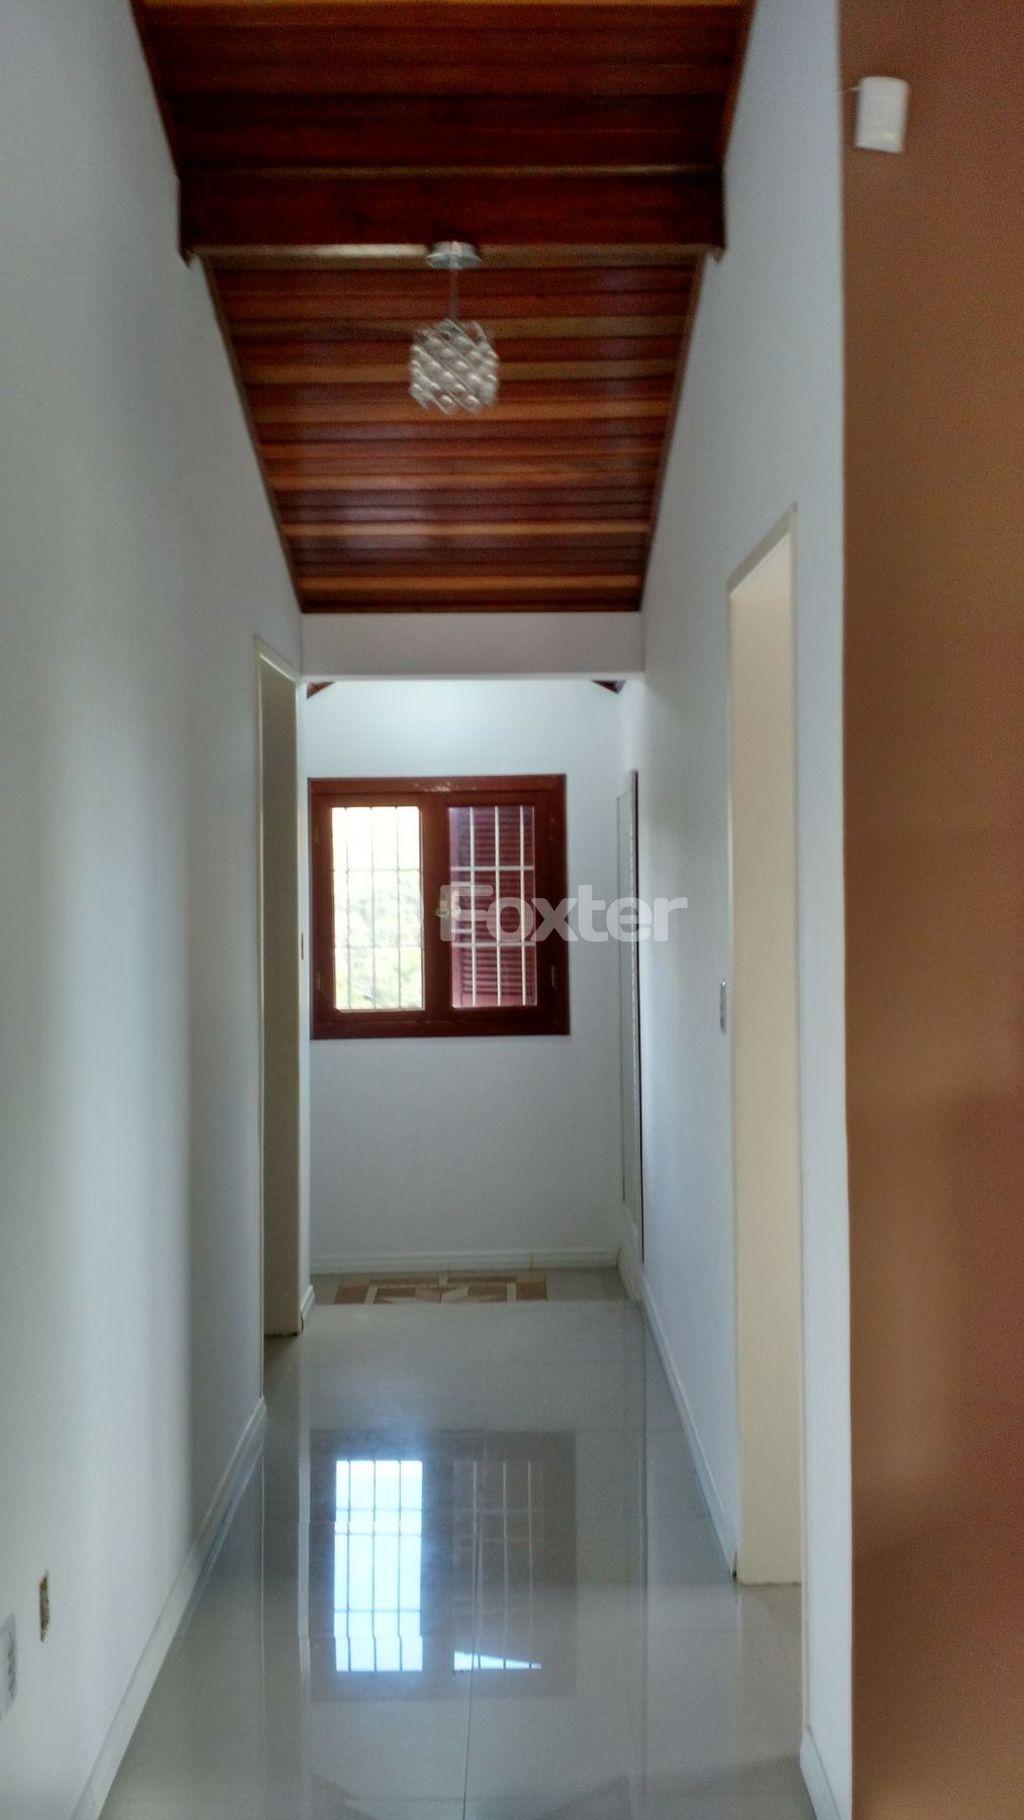 Foxter Imobiliária - Terreno 4 Dorm, Vila Nova - Foto 7